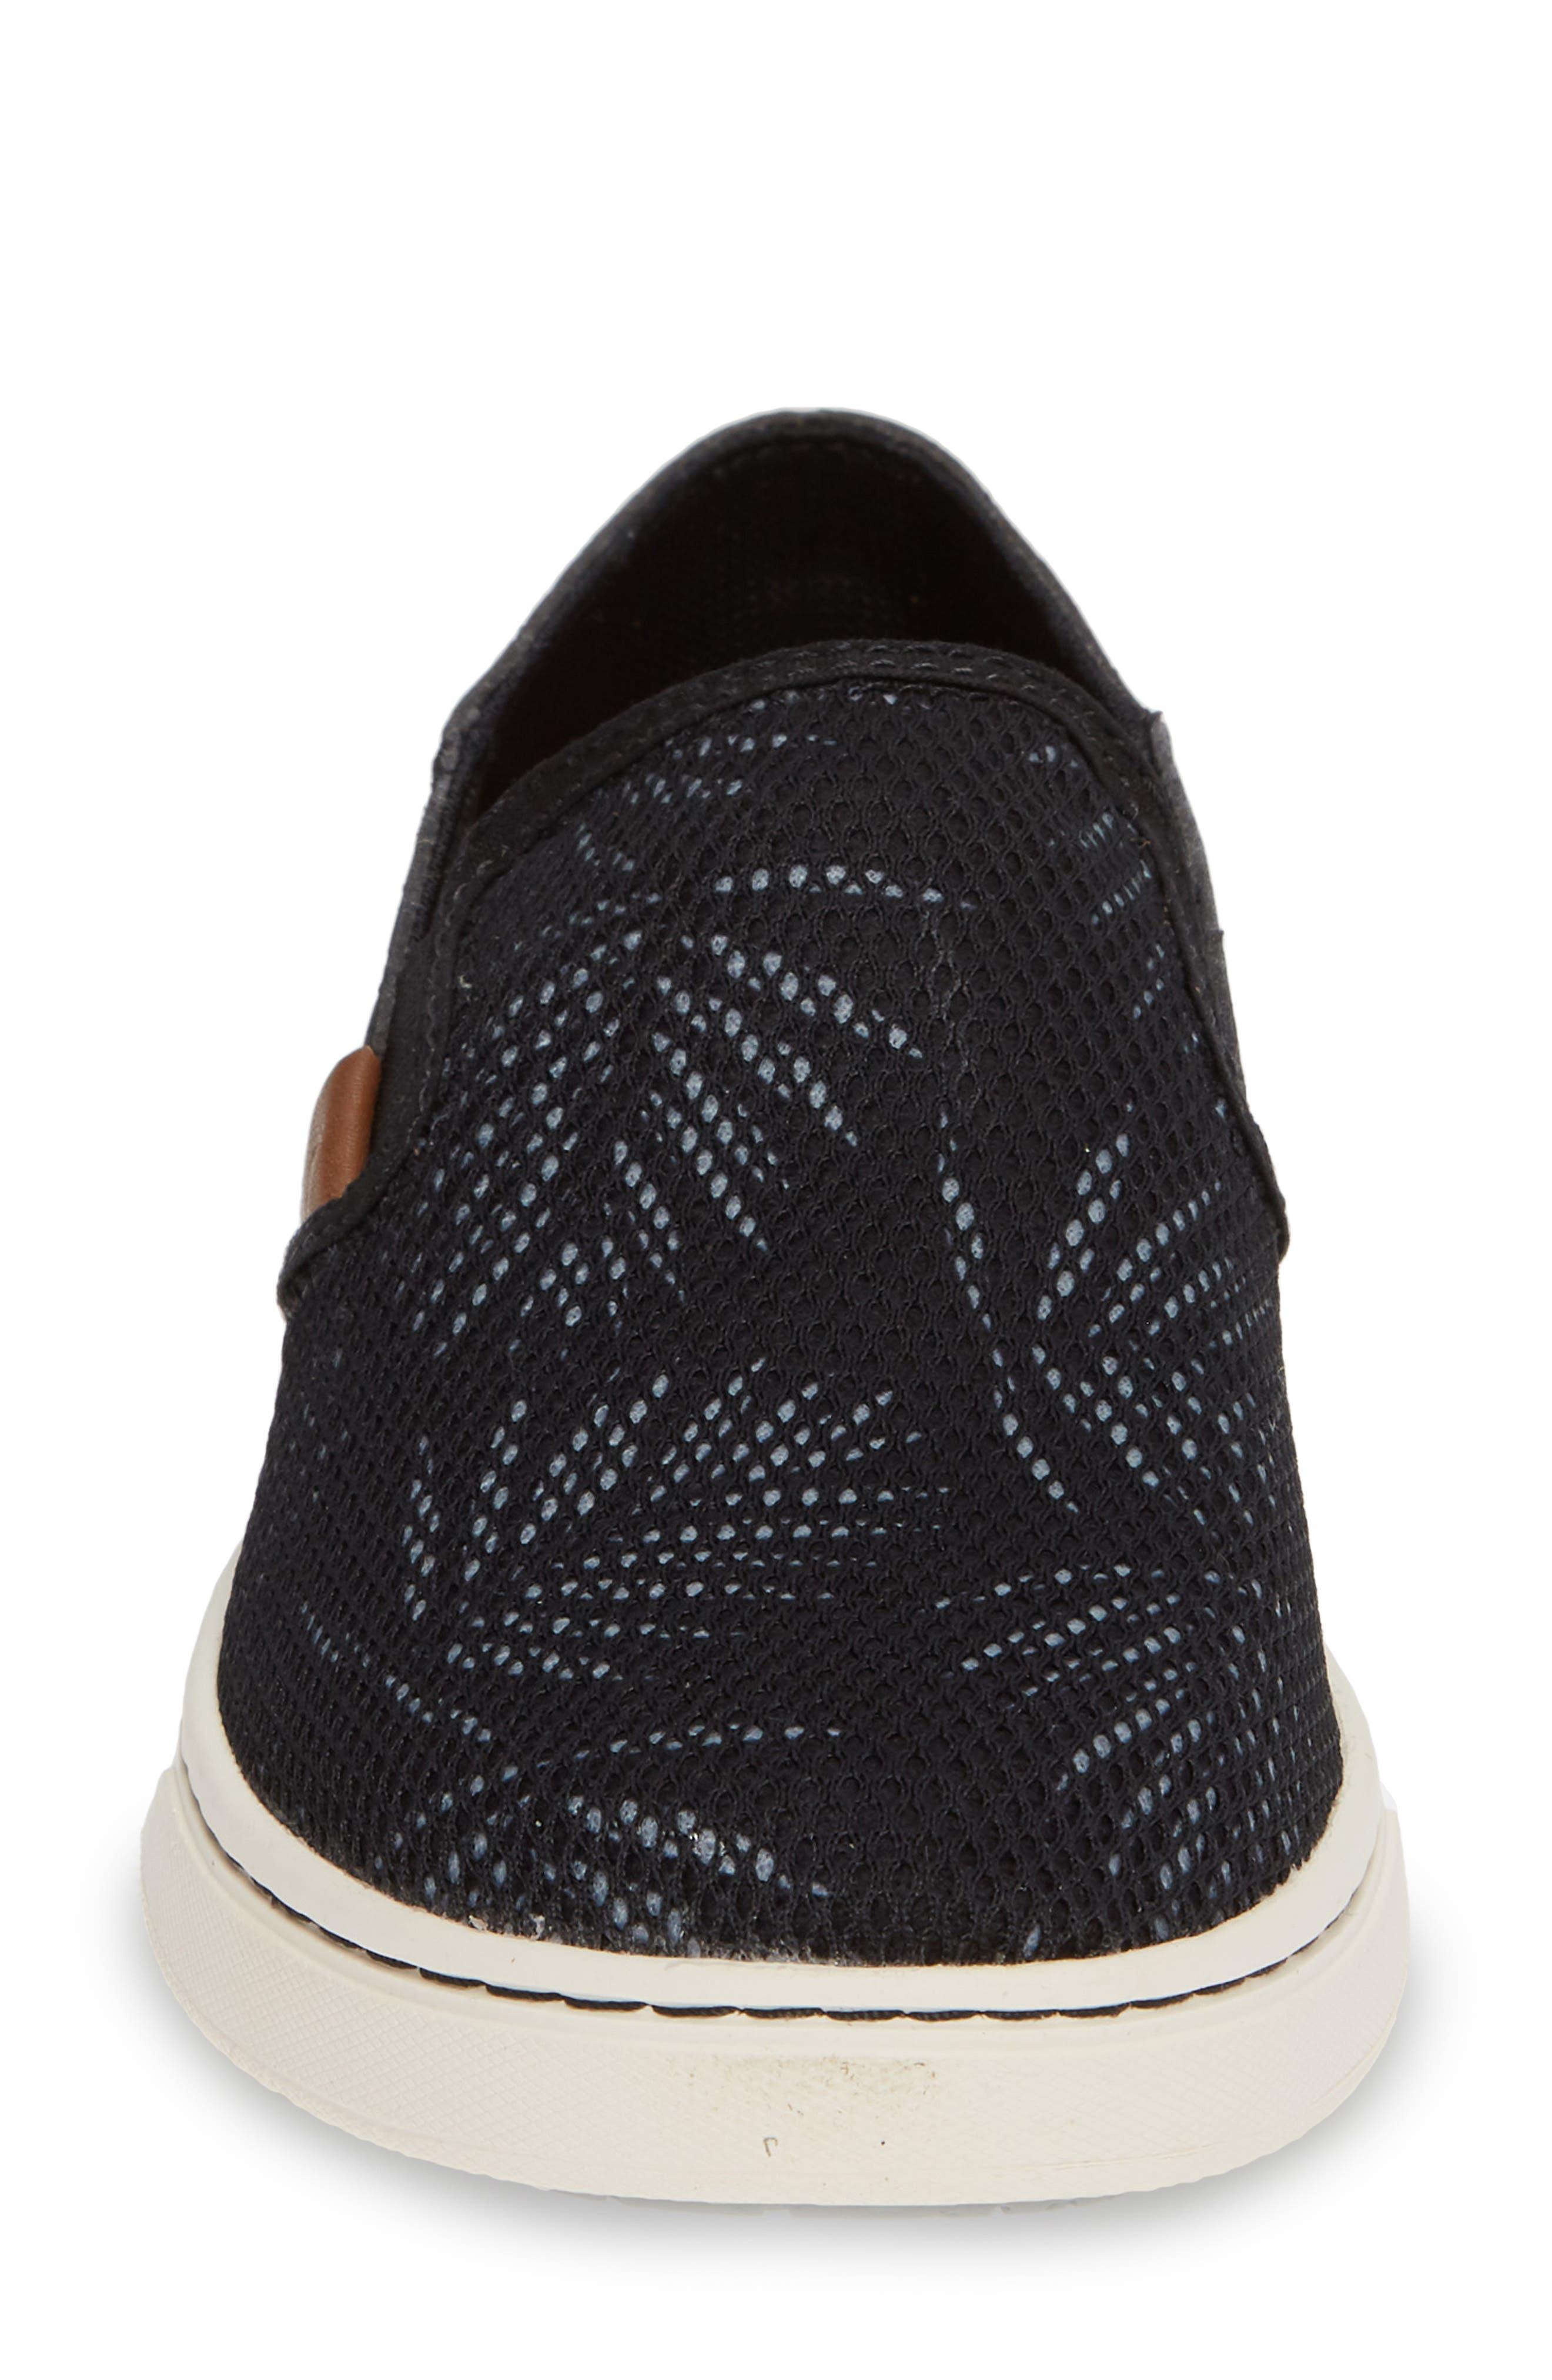 'Pehuea' Slip-On Sneaker,                             Alternate thumbnail 4, color,                             BLACK/ PALM FABRIC